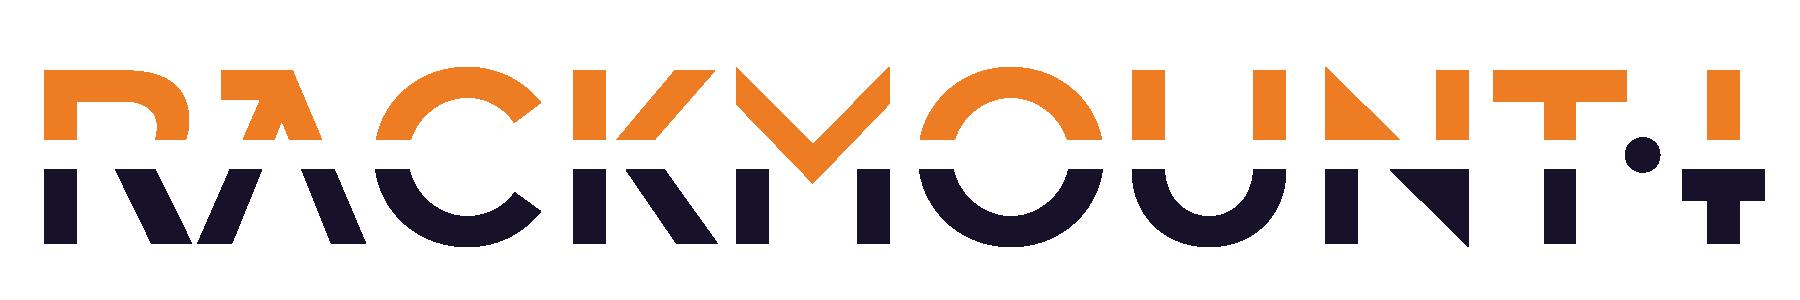 Rackmount IT Logo